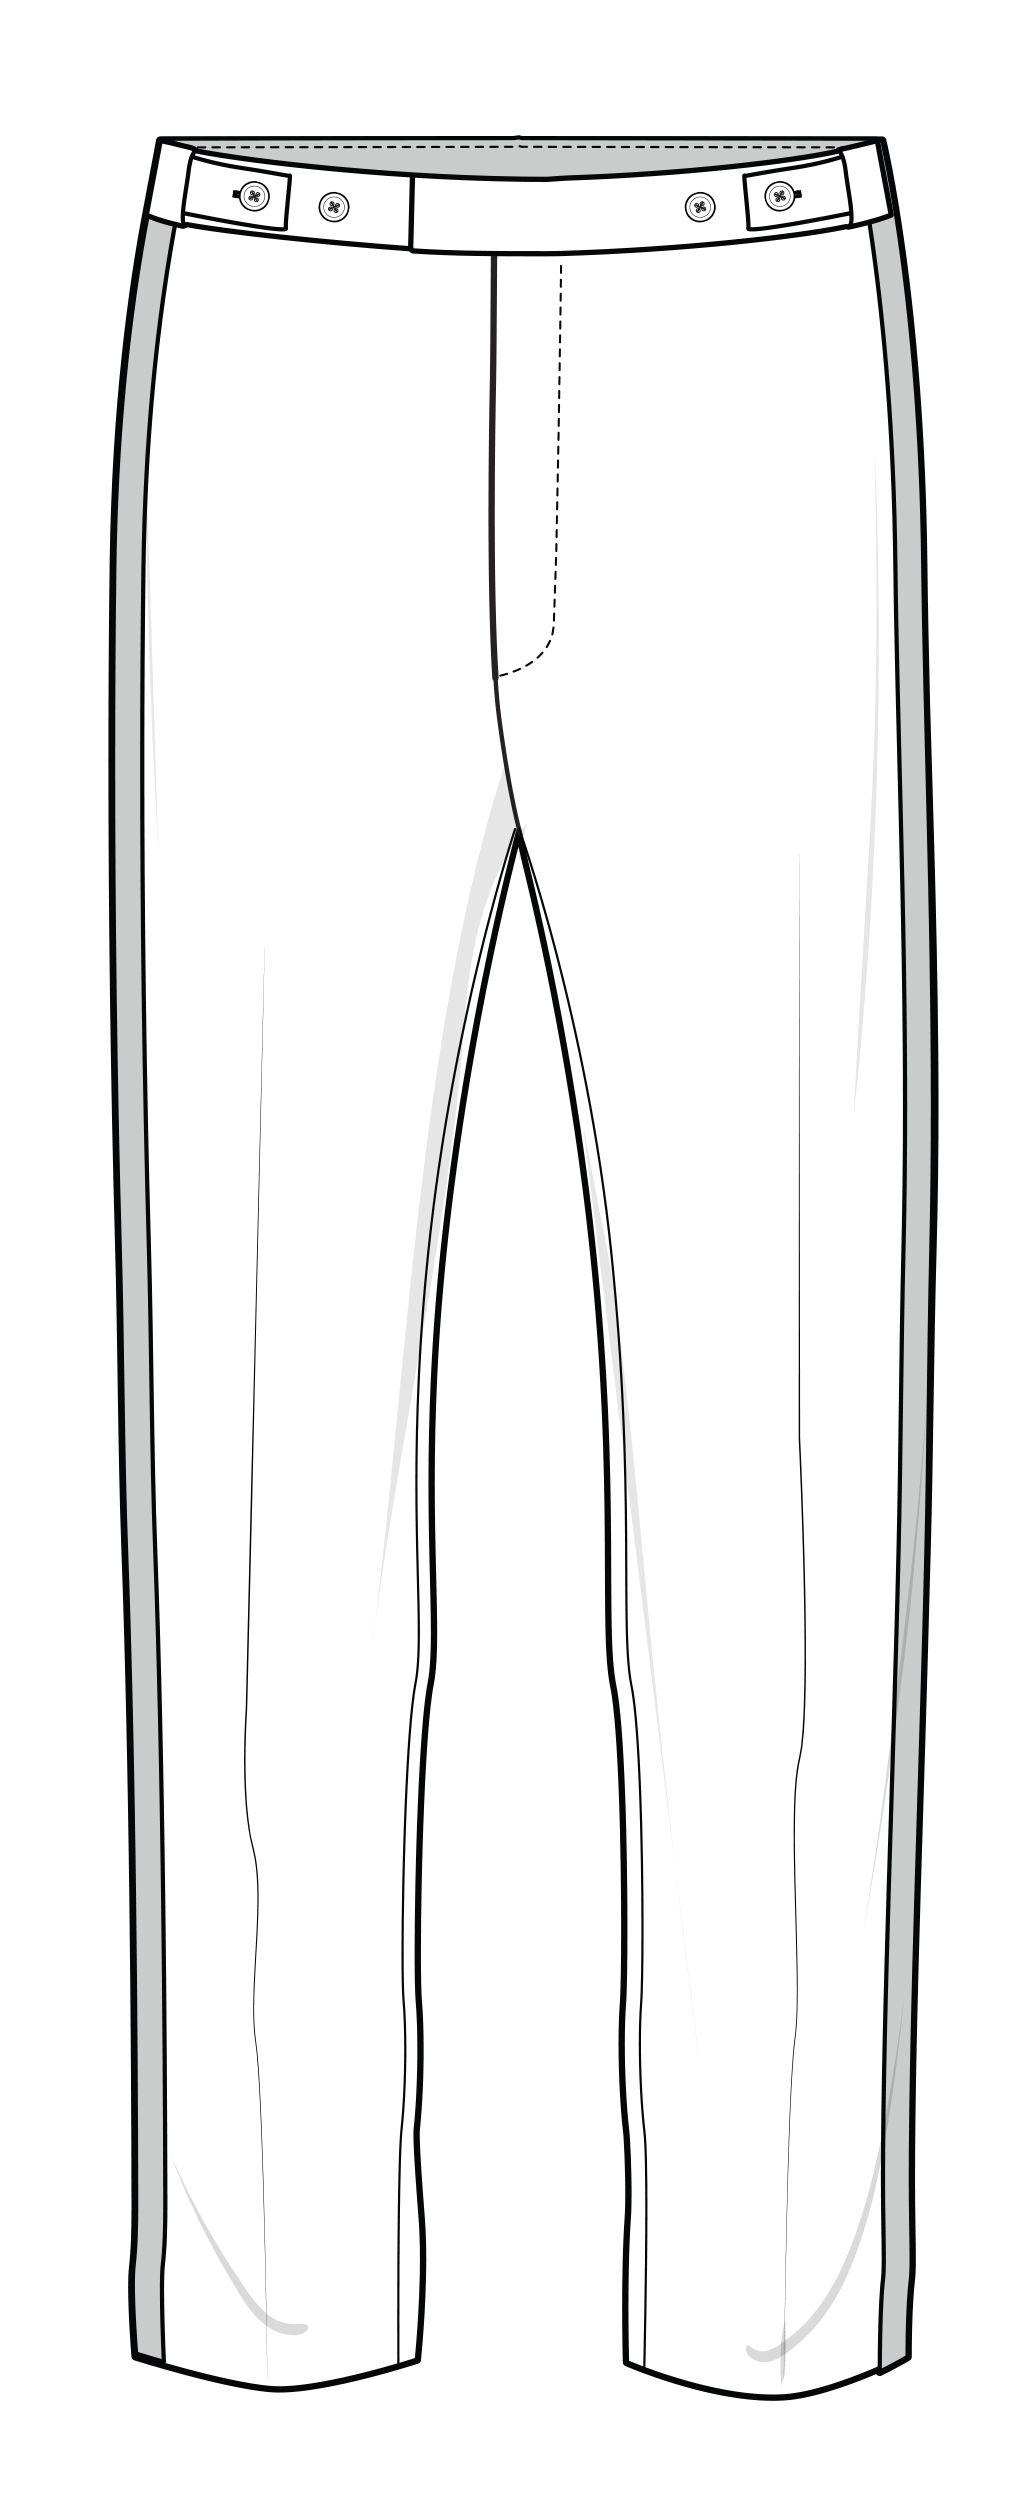 Menswear Flat Drawing13 Jpg 1029 2495 Disegni Di Moda Disegno Di Moda Disegno Moda